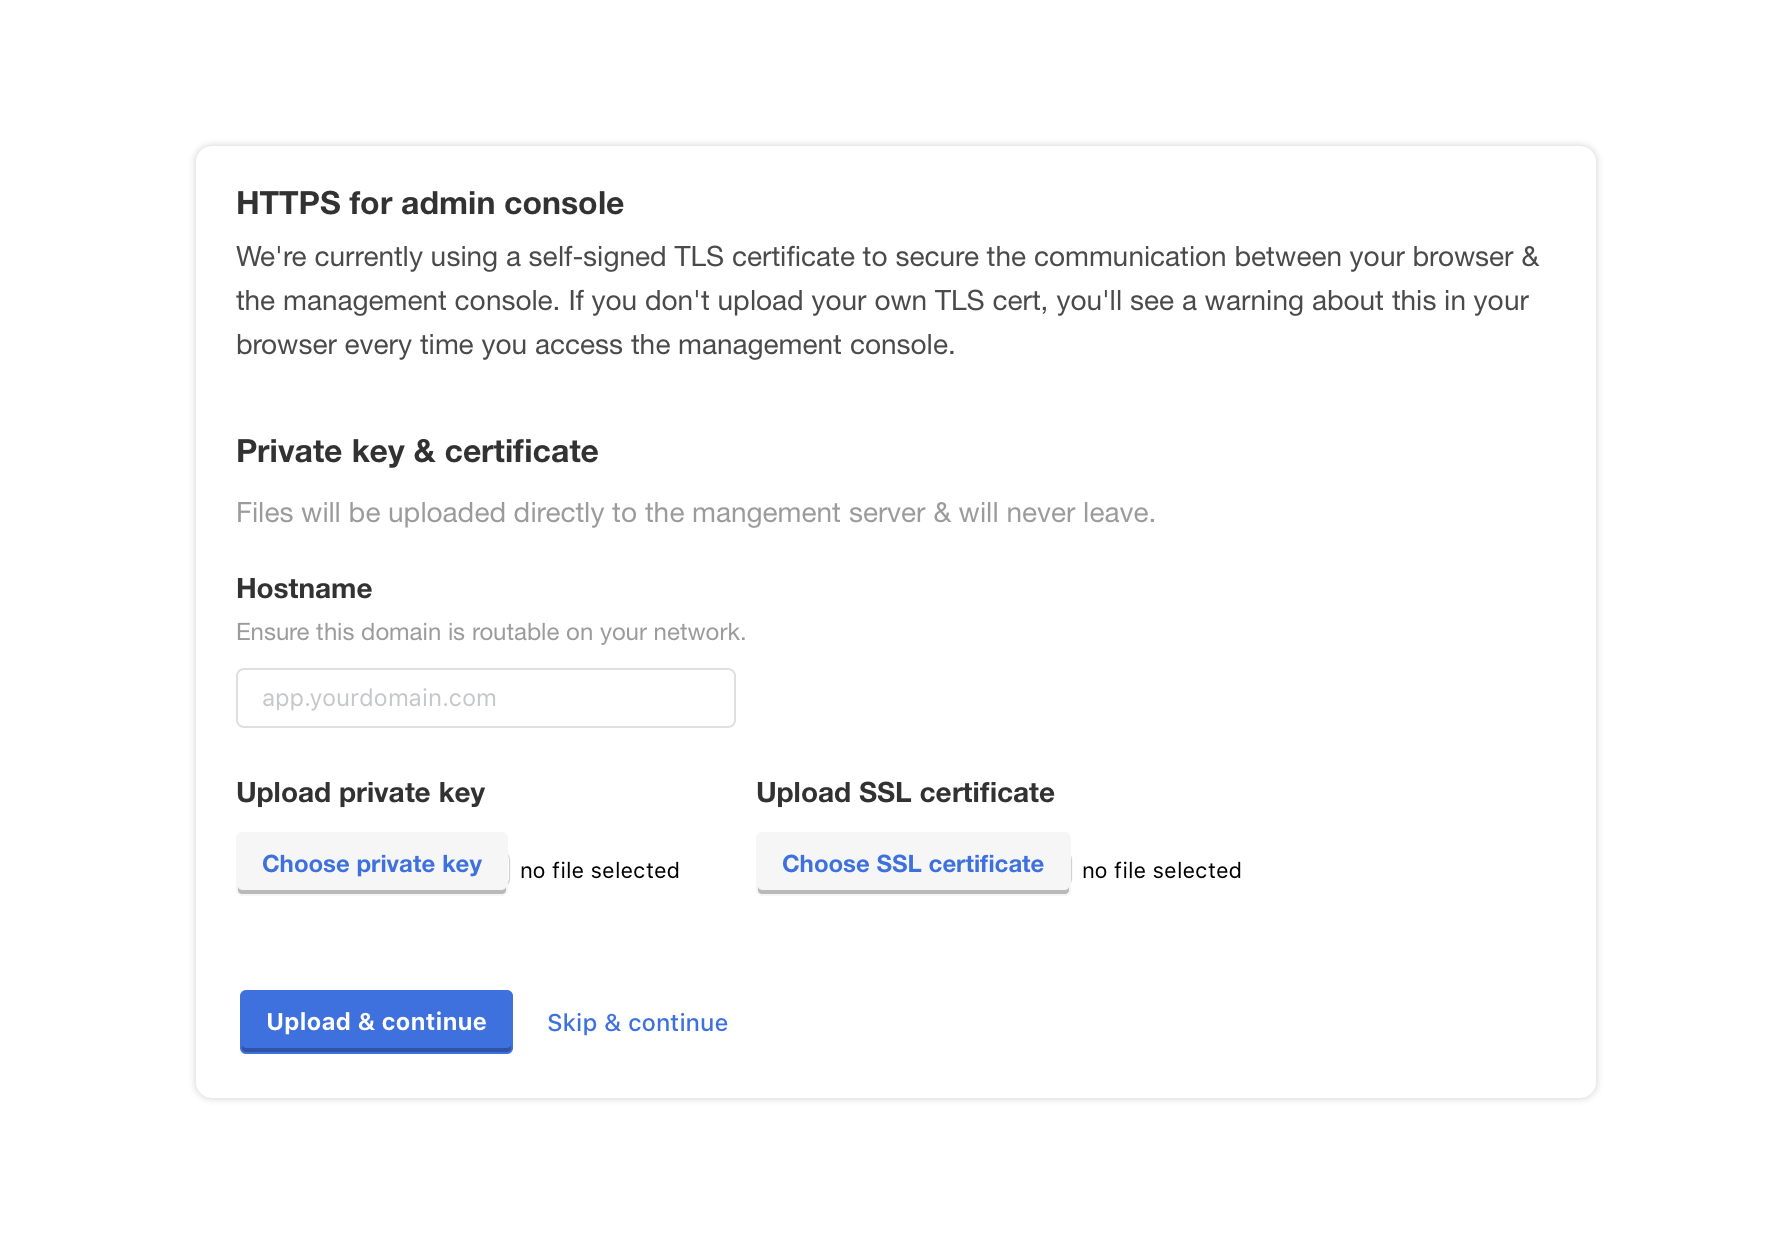 Console TLS